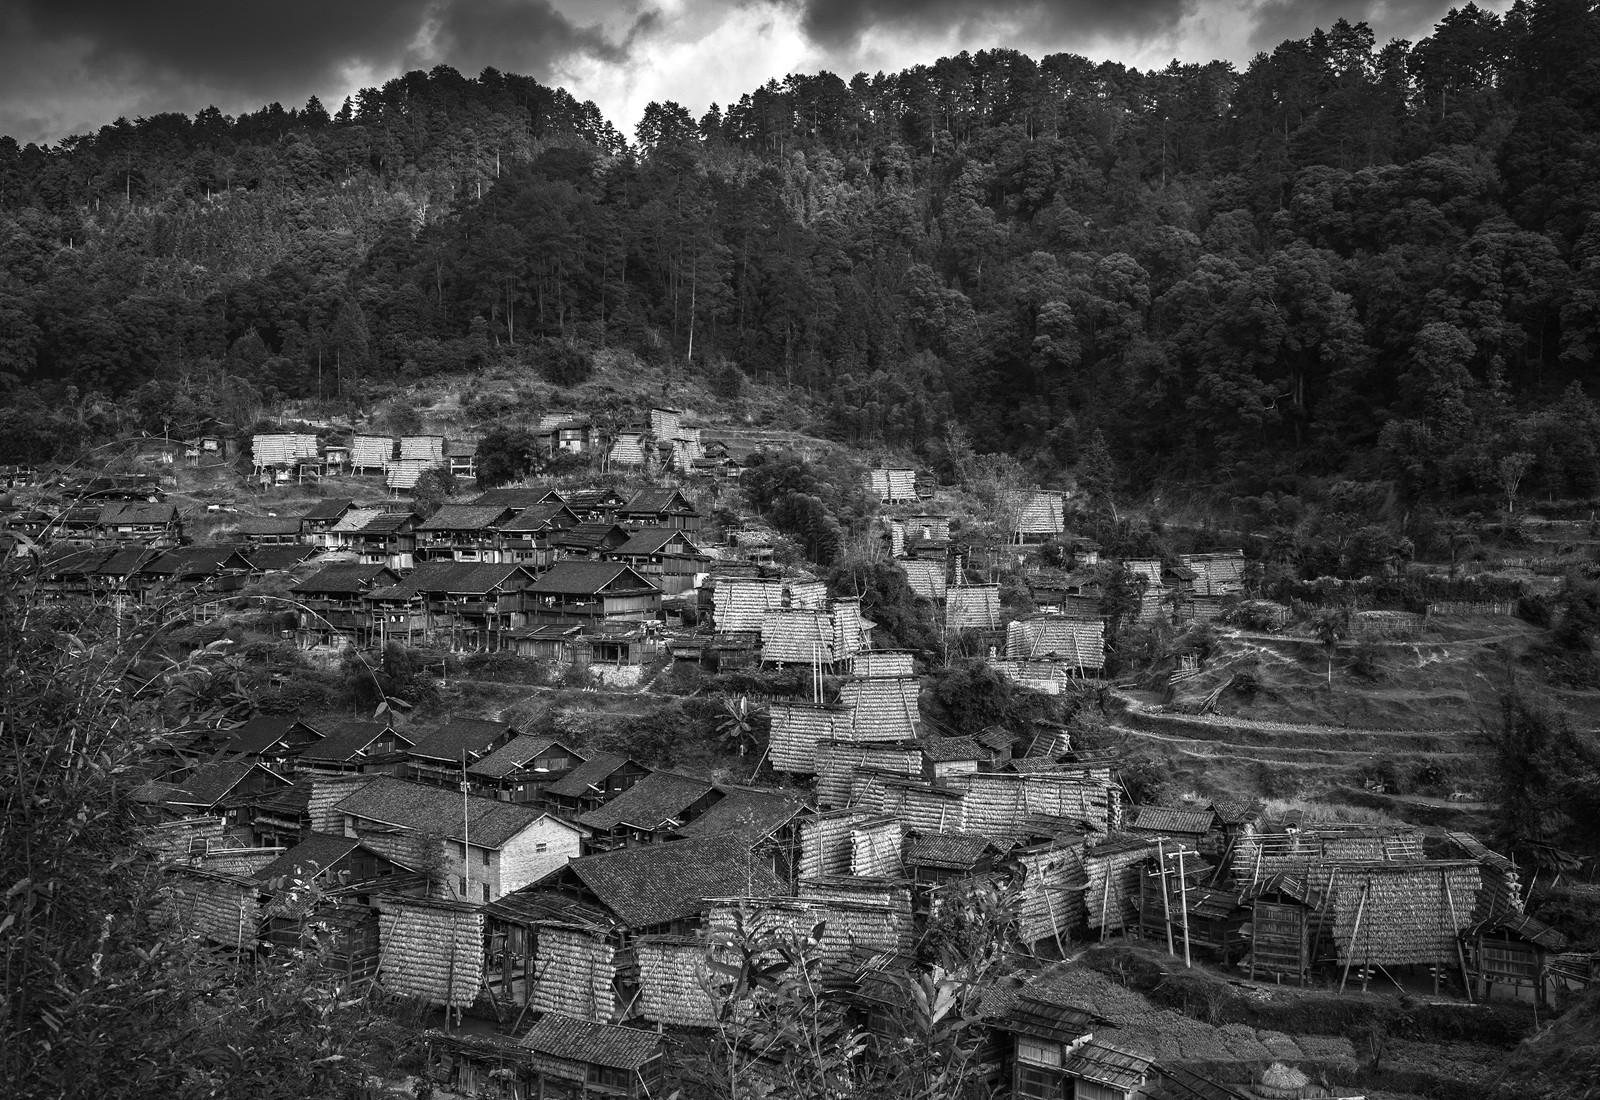 kuang-huimin-ancient-kam-rice-of-millennium-photography-of-china-(19).jpg